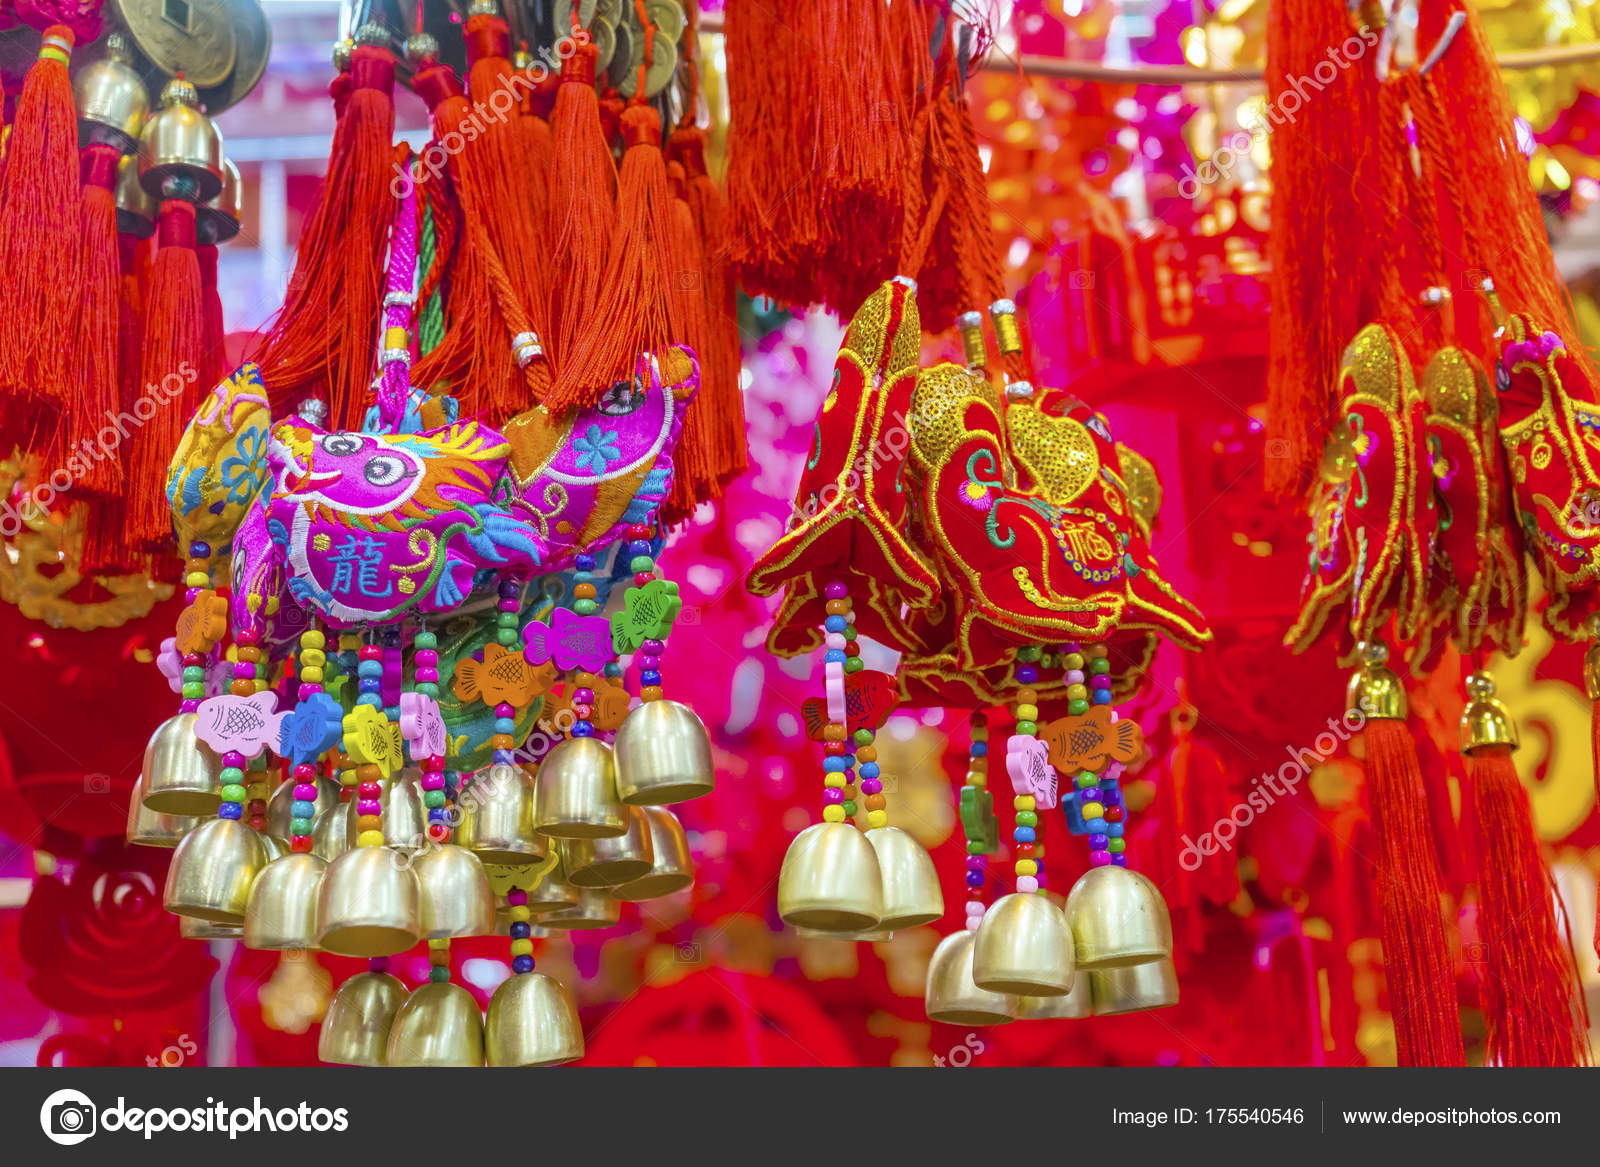 Hunde Drachen Geld Chinese Lunar New Year Dekorationen Peking China ...